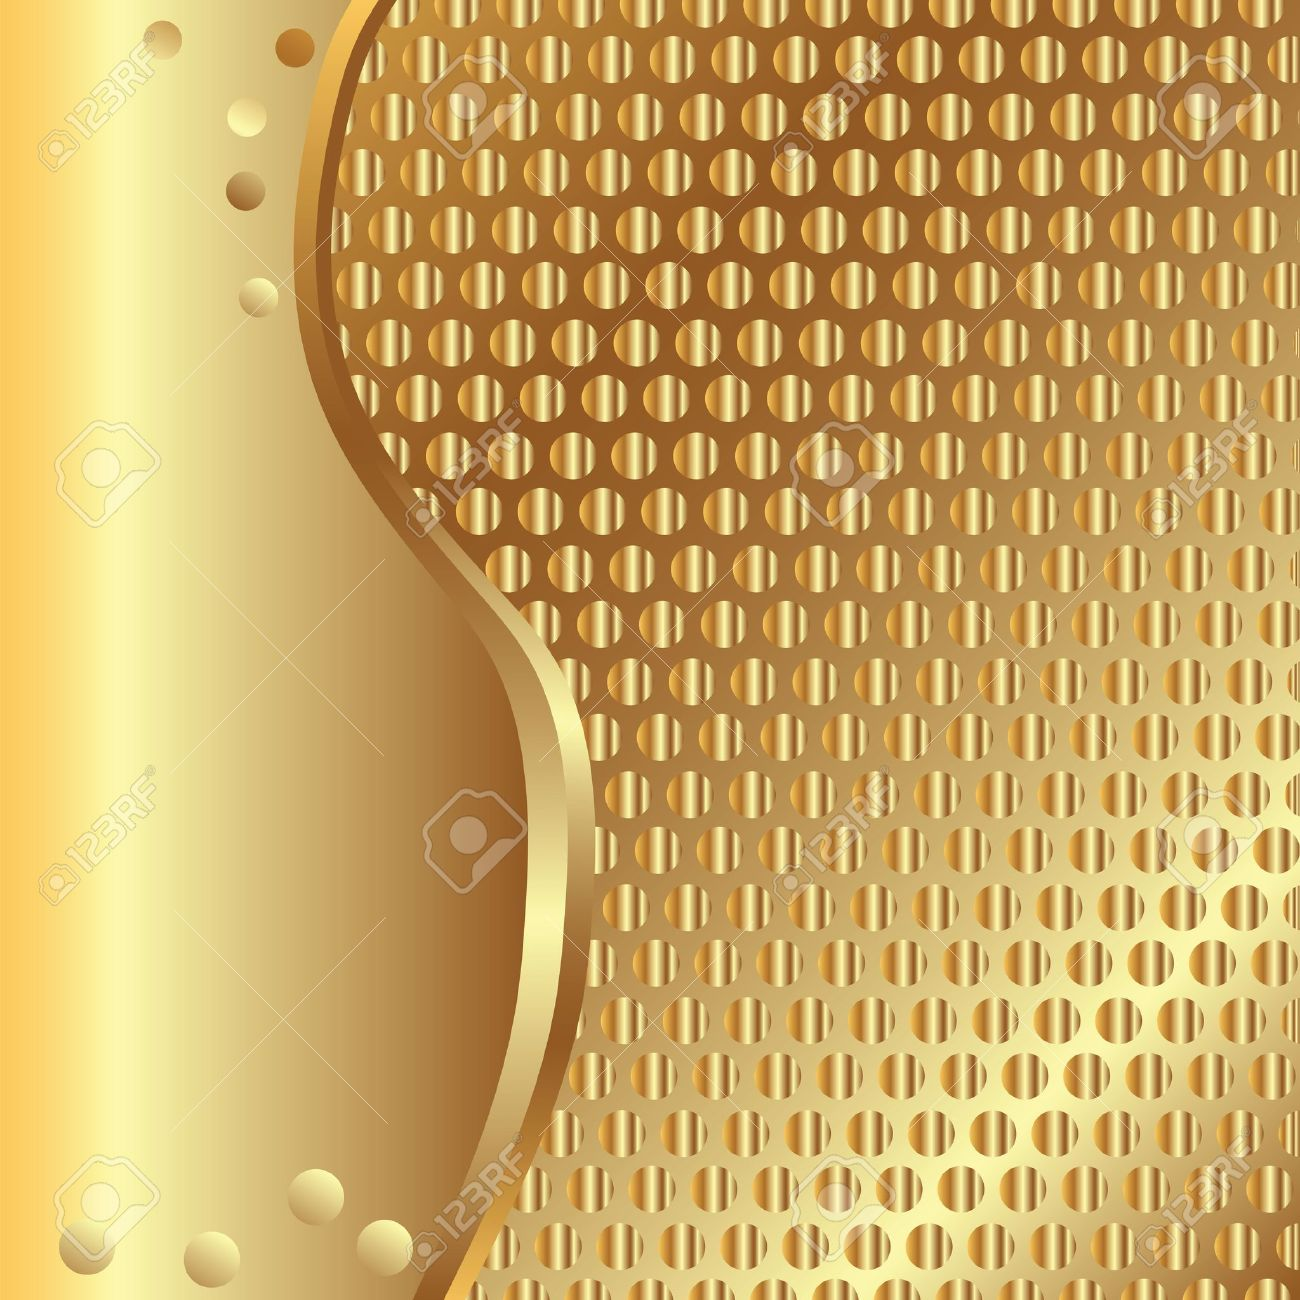 Gold Glitter Vector Gold Glitter Vector Gold